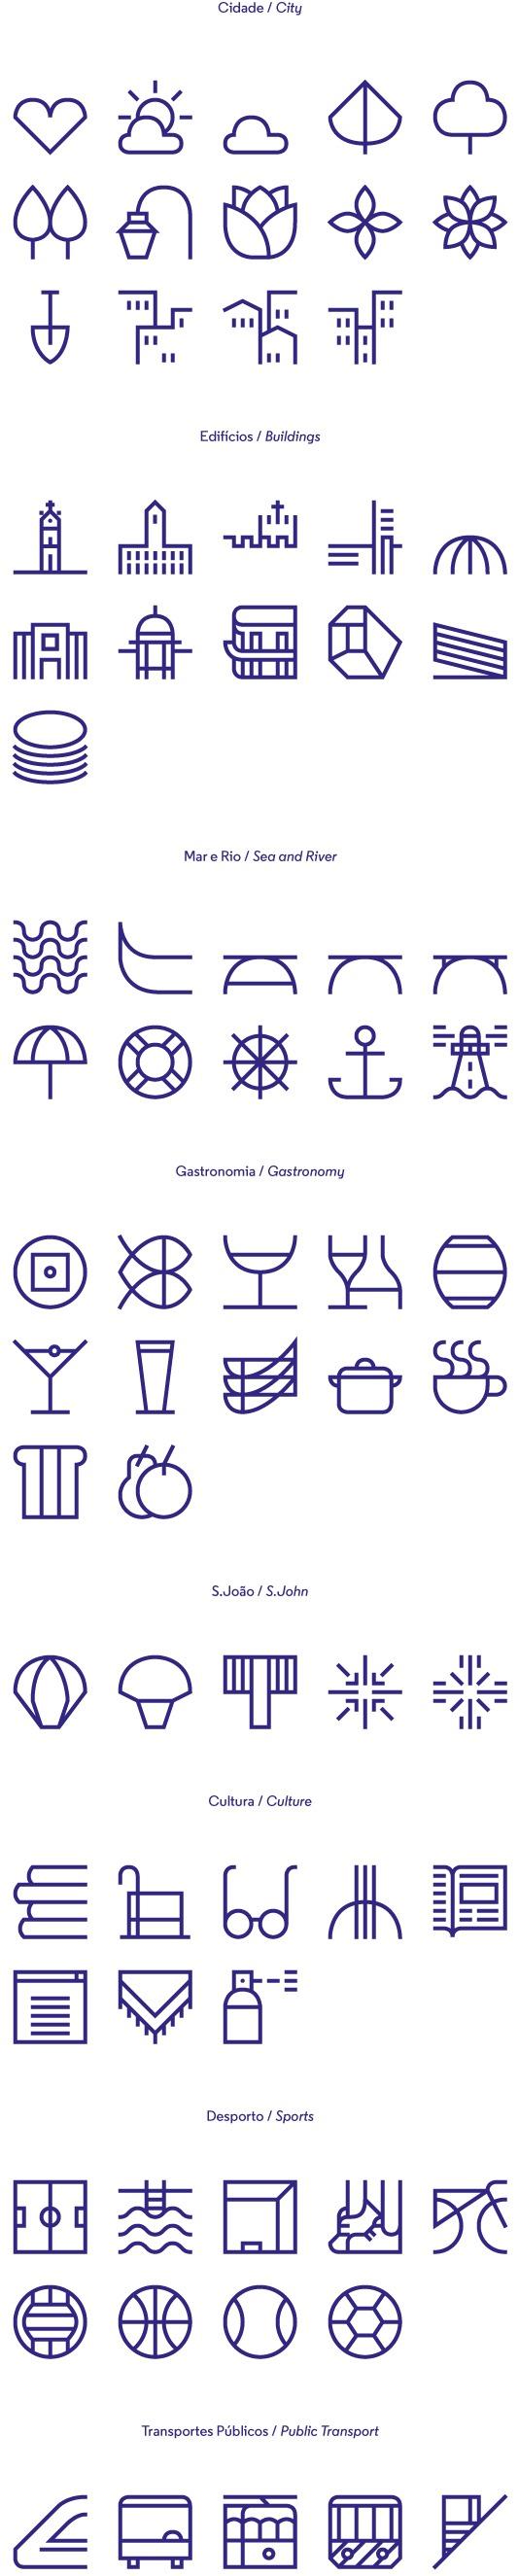 Icons / Symbols / New identity for the city of Porto on Behance